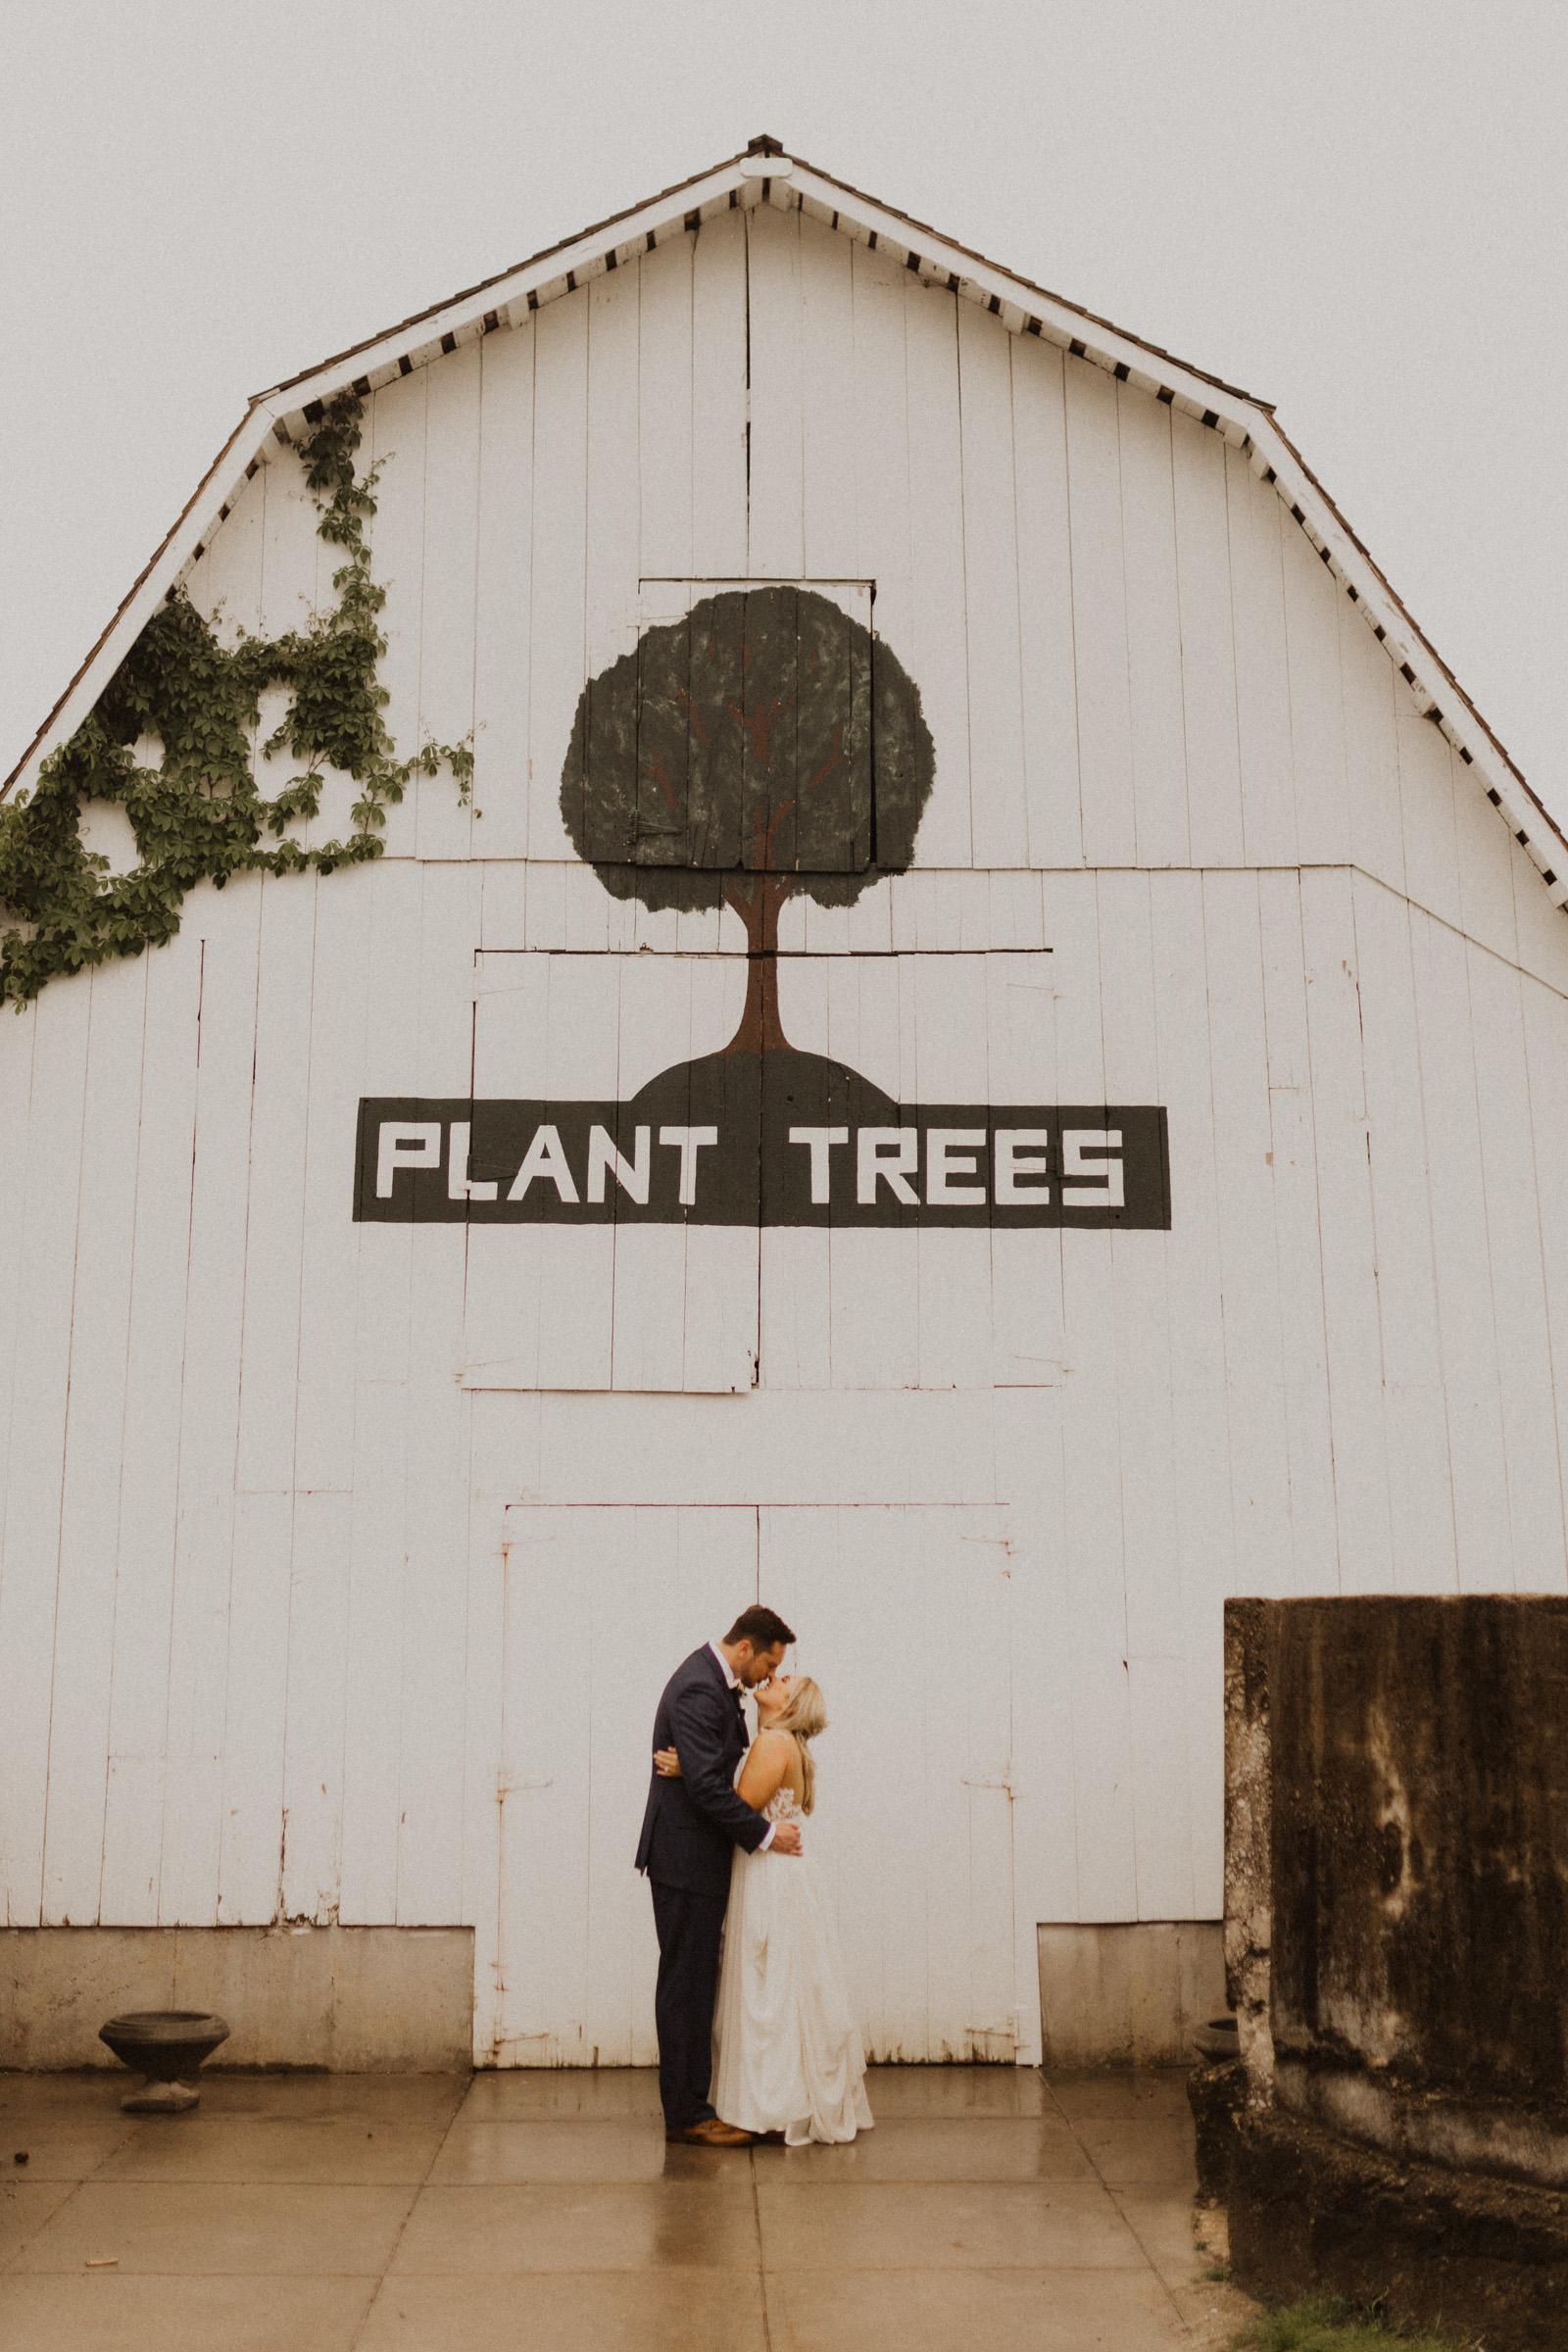 alyssa barletter photography nelson wedding nebraska city lied lodge morton barn spring wedding photographer-46.jpg